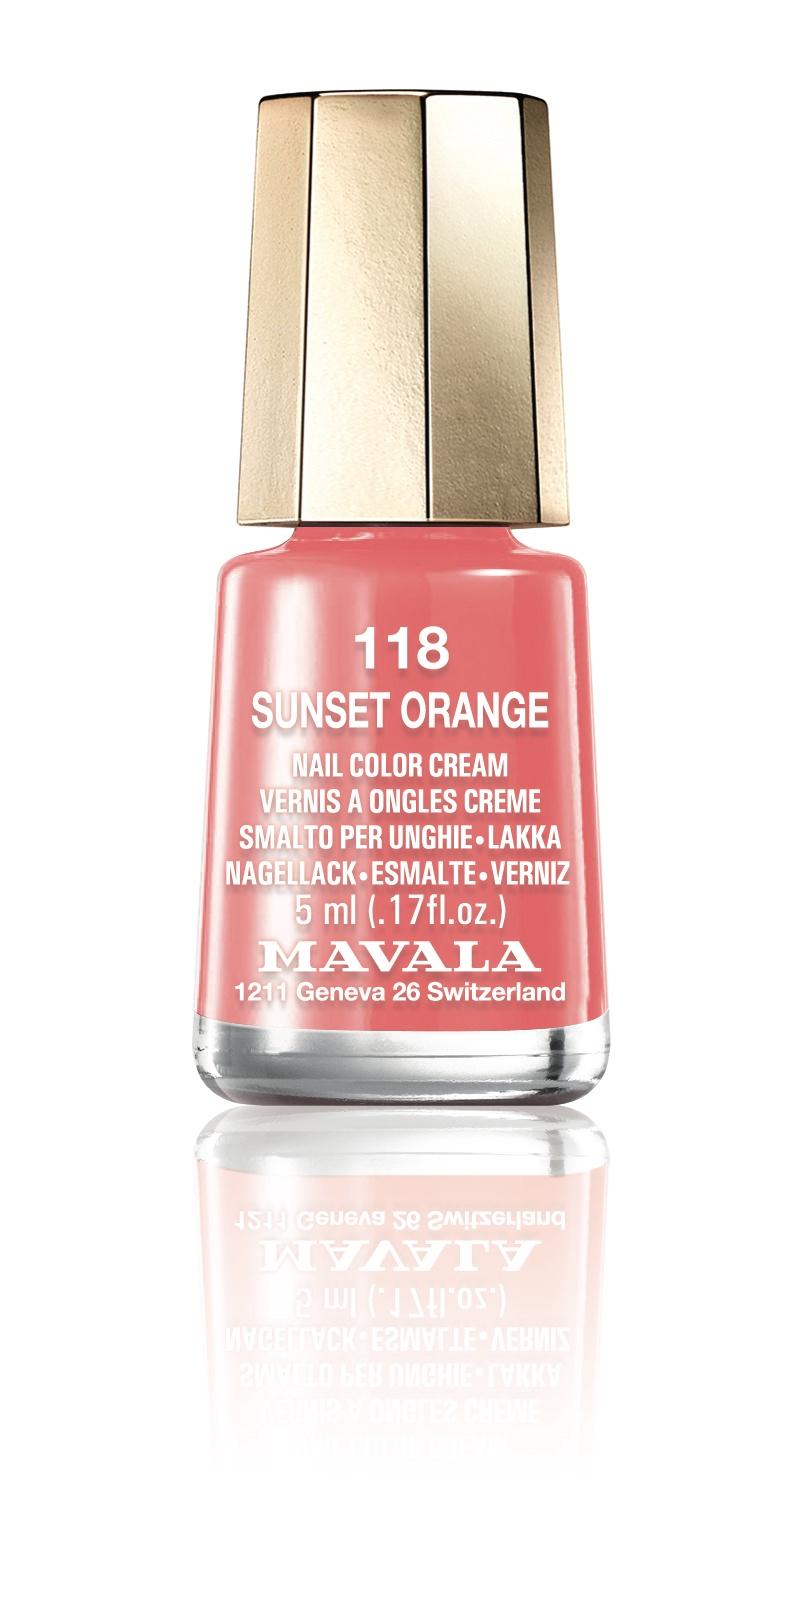 118 SUNSET ORANGE